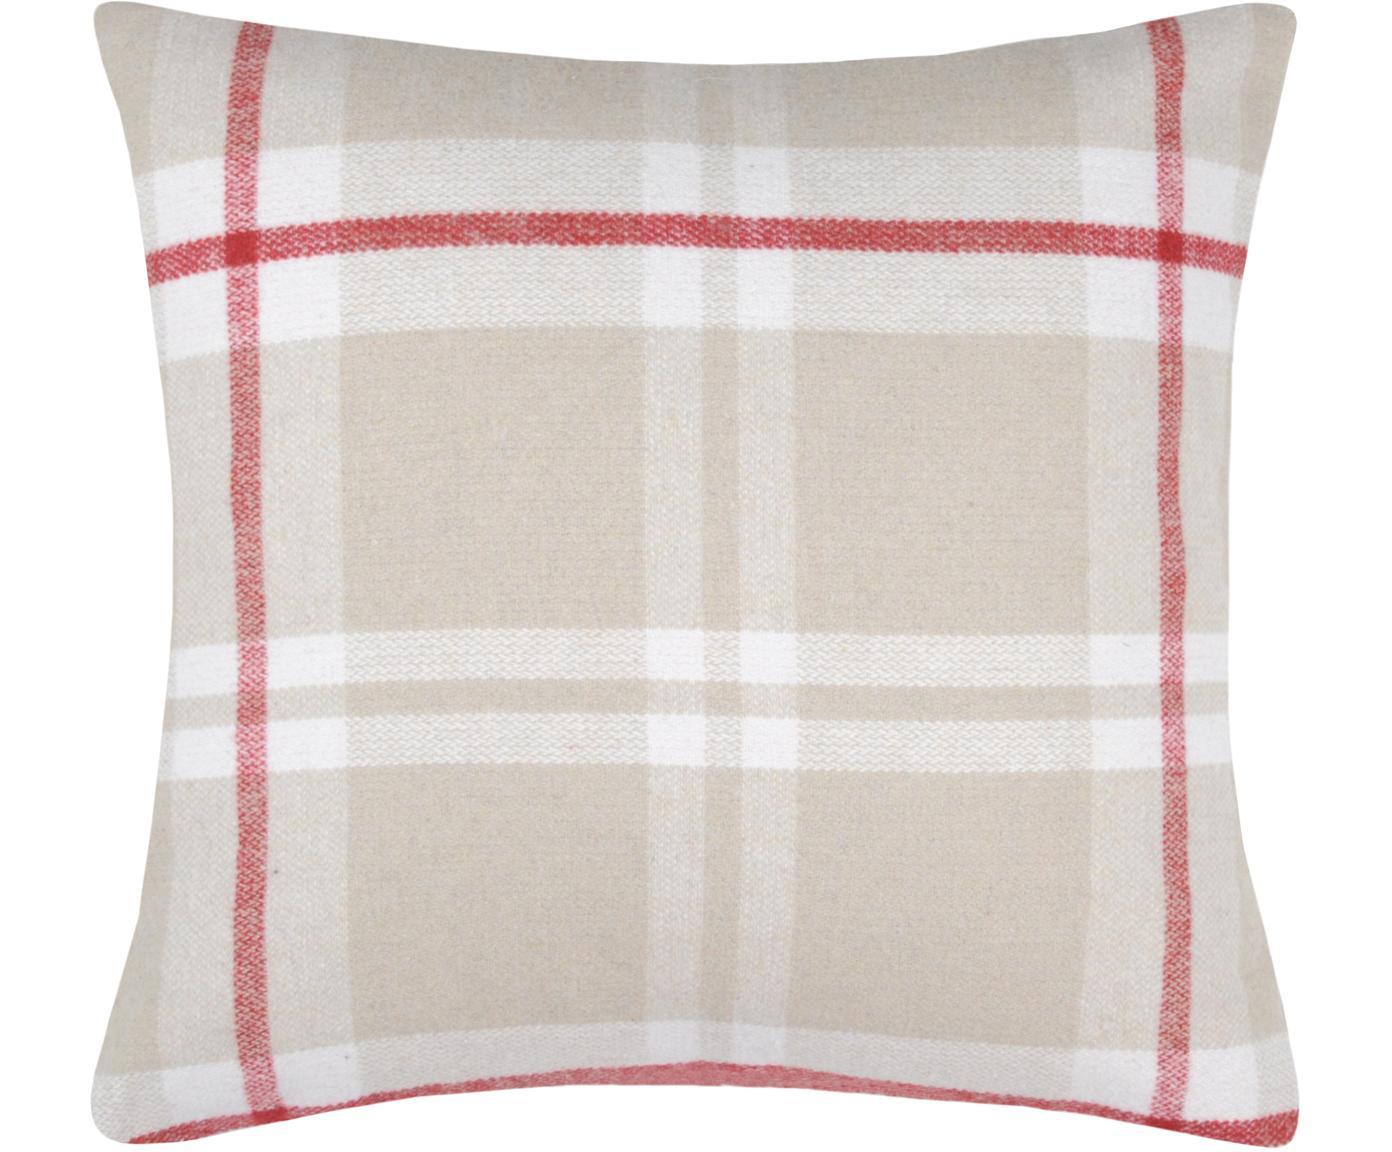 Geruite kussenhoes Granier, 95% polyester, 5% wol, Beige, wit, rood, 40 x 40 cm